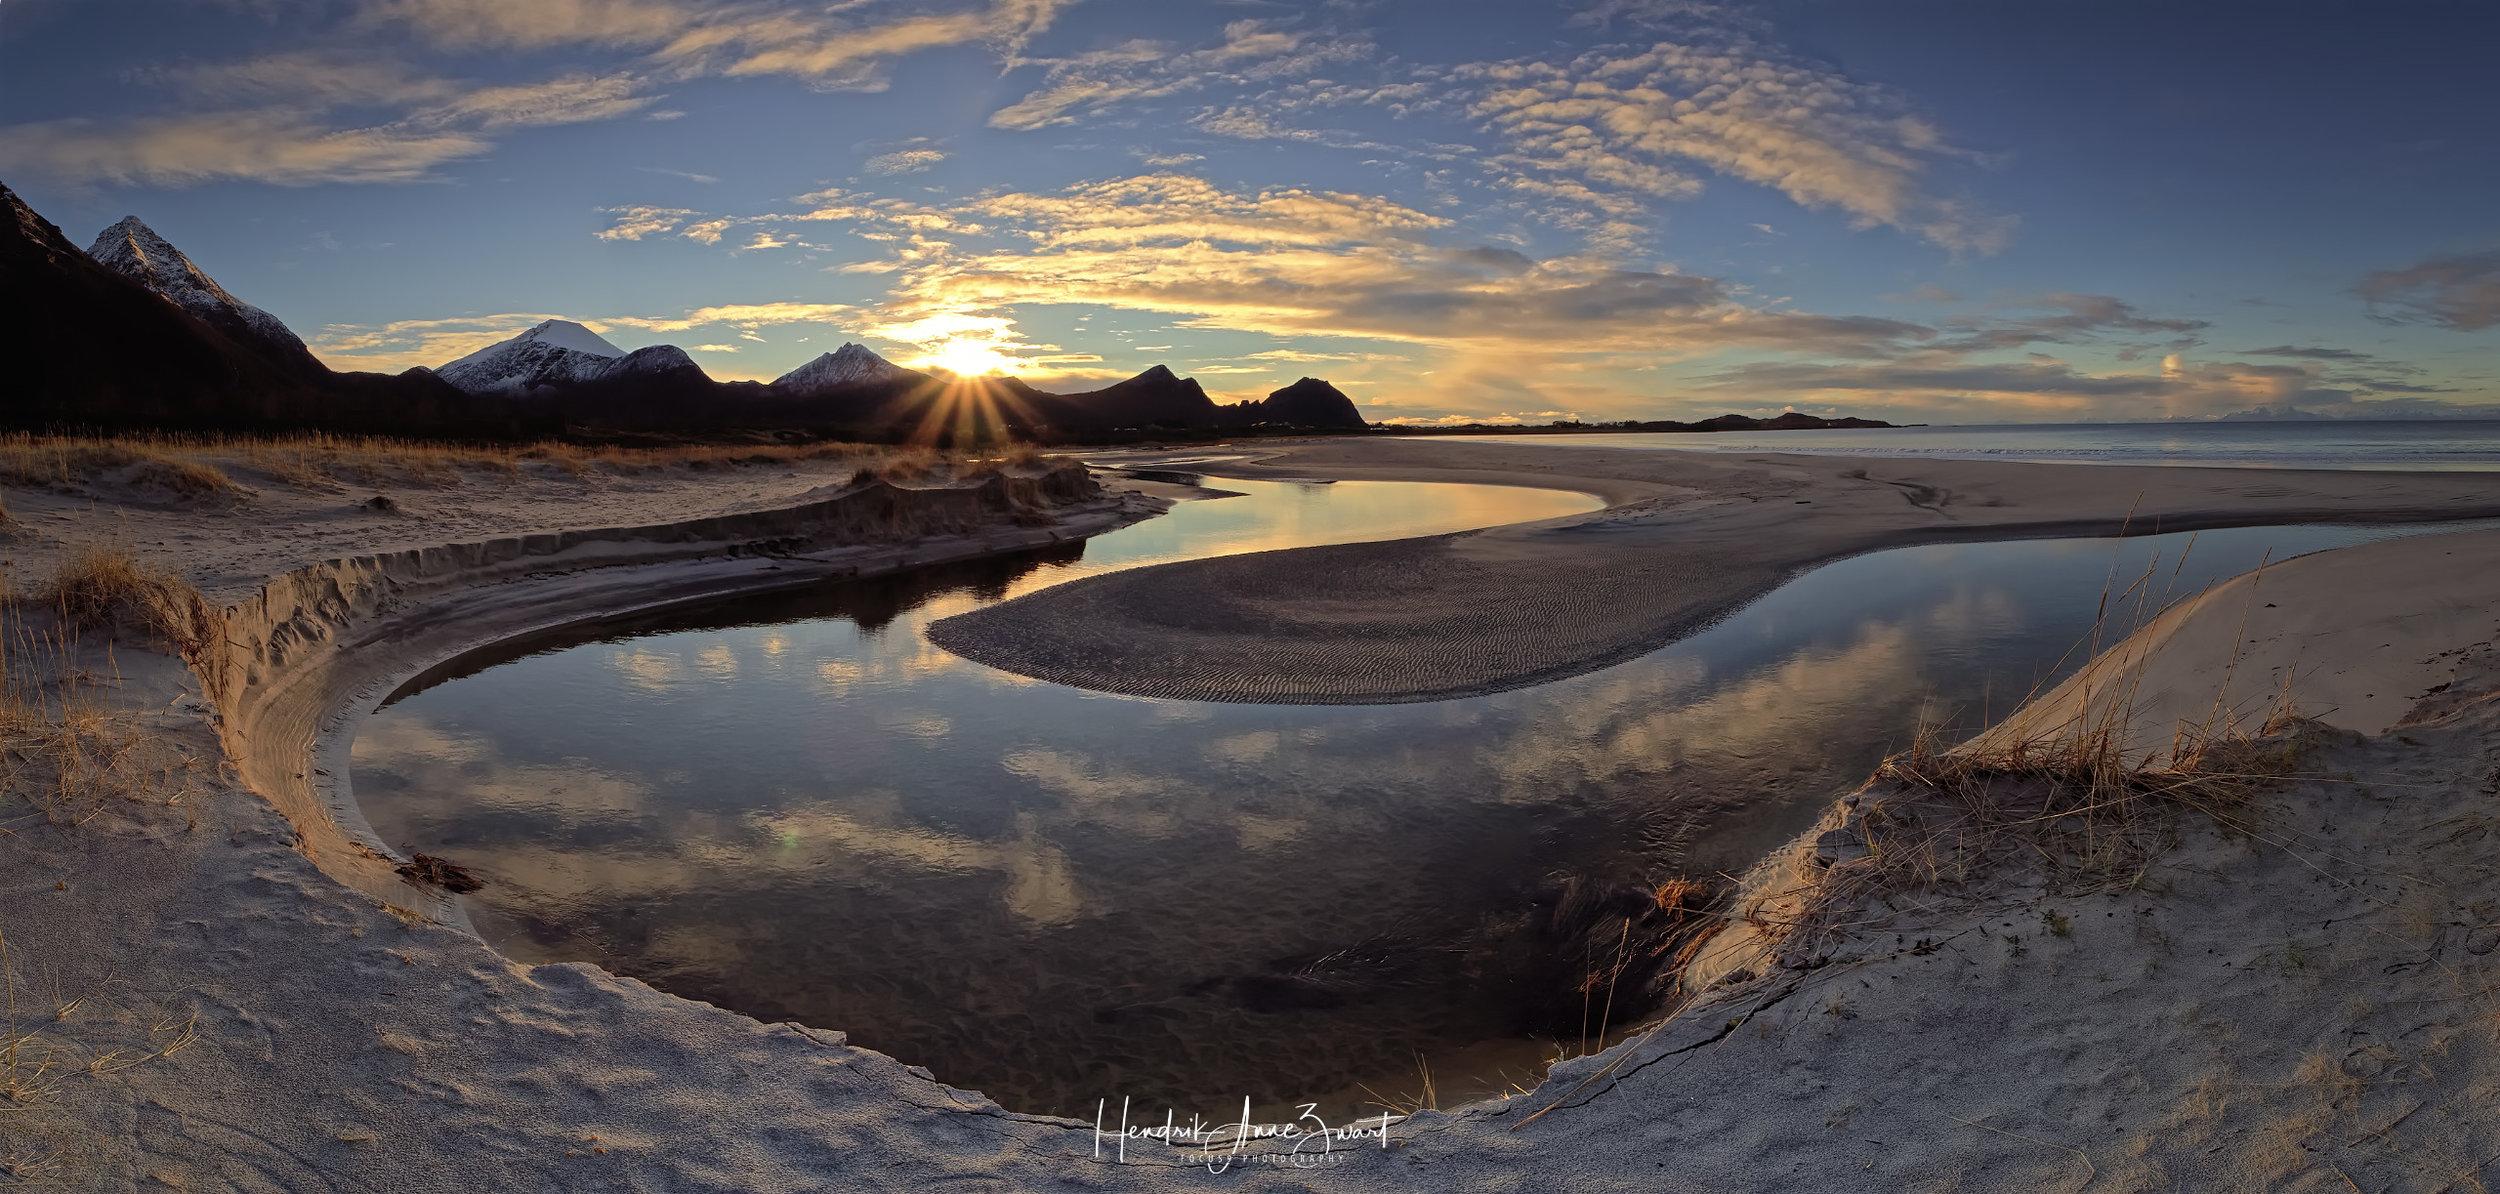 Bo_Norway_Sunset_1.jpg